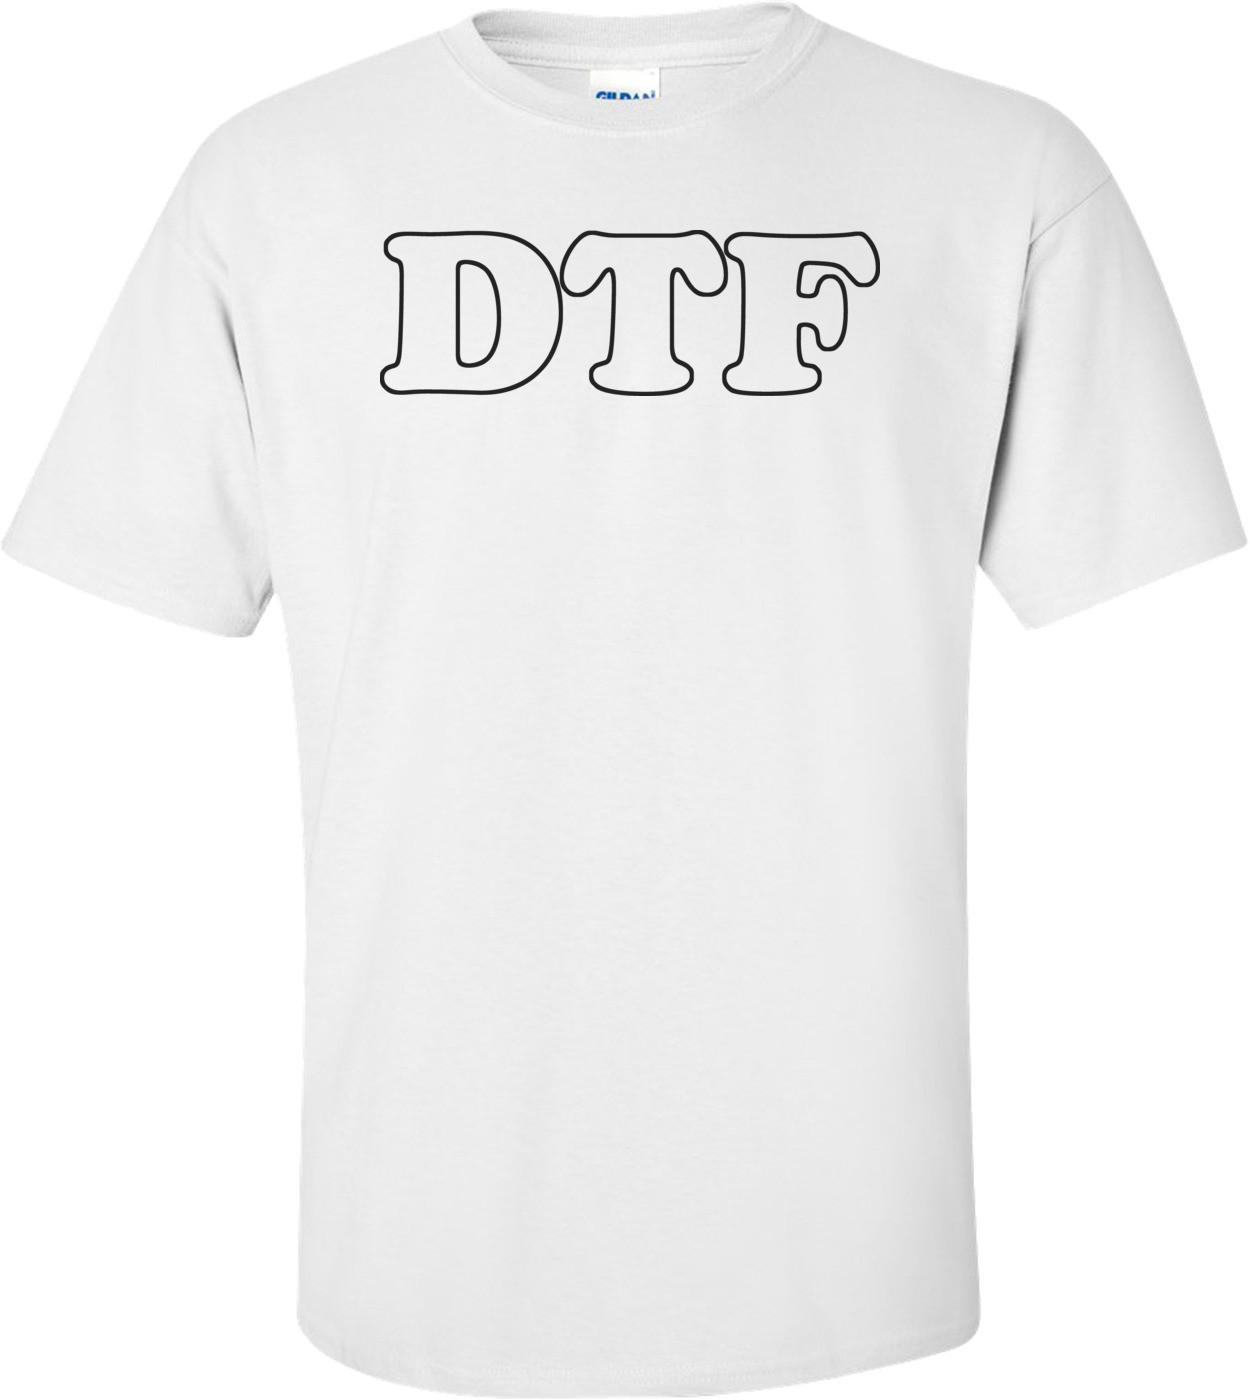 DTF Shirt